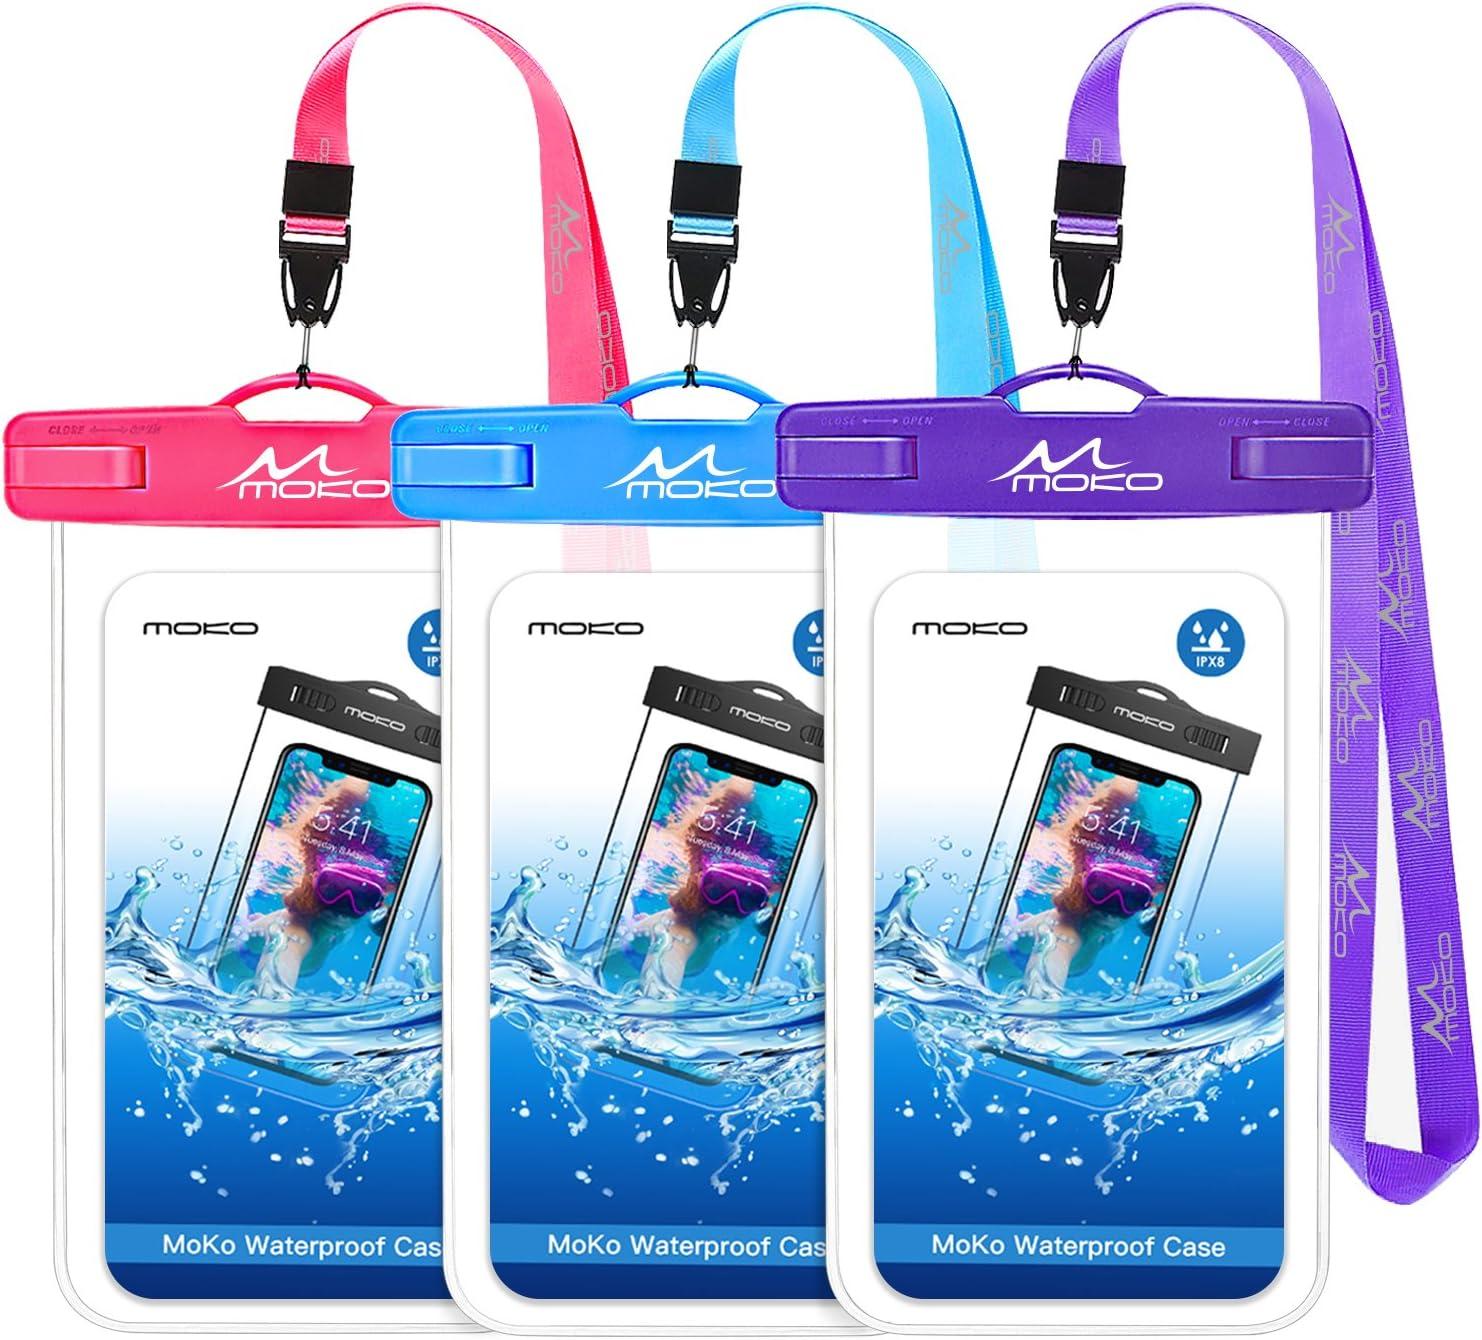 MoKo Bolsa Impermeable para Teléfono,[3PZS] Estancas Flotante Funda Universal con Correa para iPhone 12,12 Mini,12 Pro,11,11 Pro,11 Pro MAX,Pixel 4 XL,Samsung S9/Note 9/S21 - Morado + Magenta + Azul